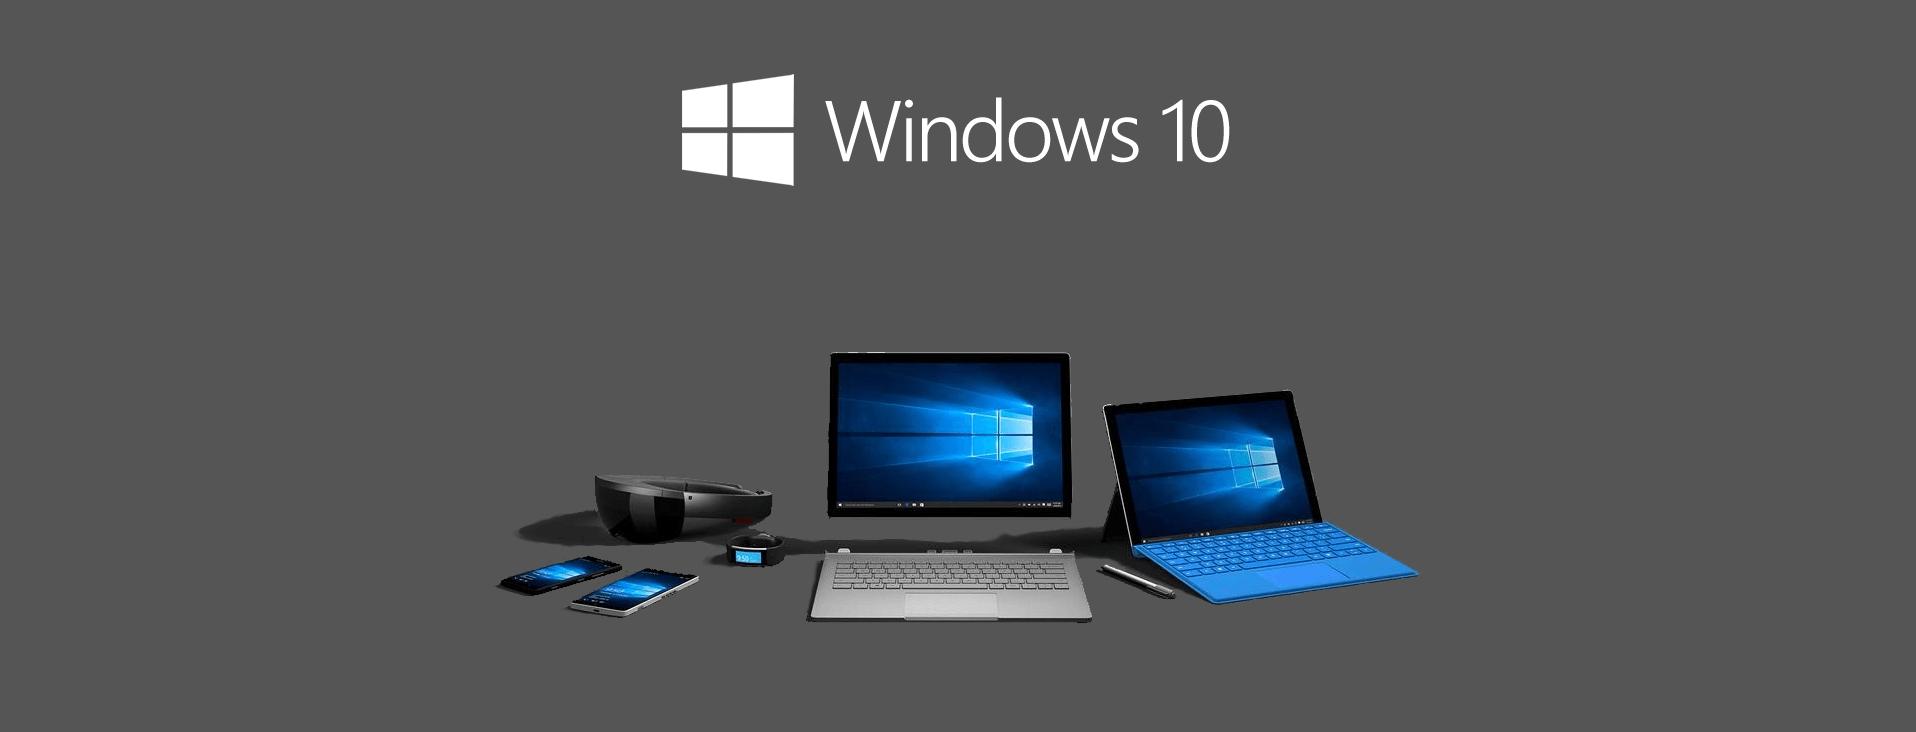 Devices Windows 10 update setup banner